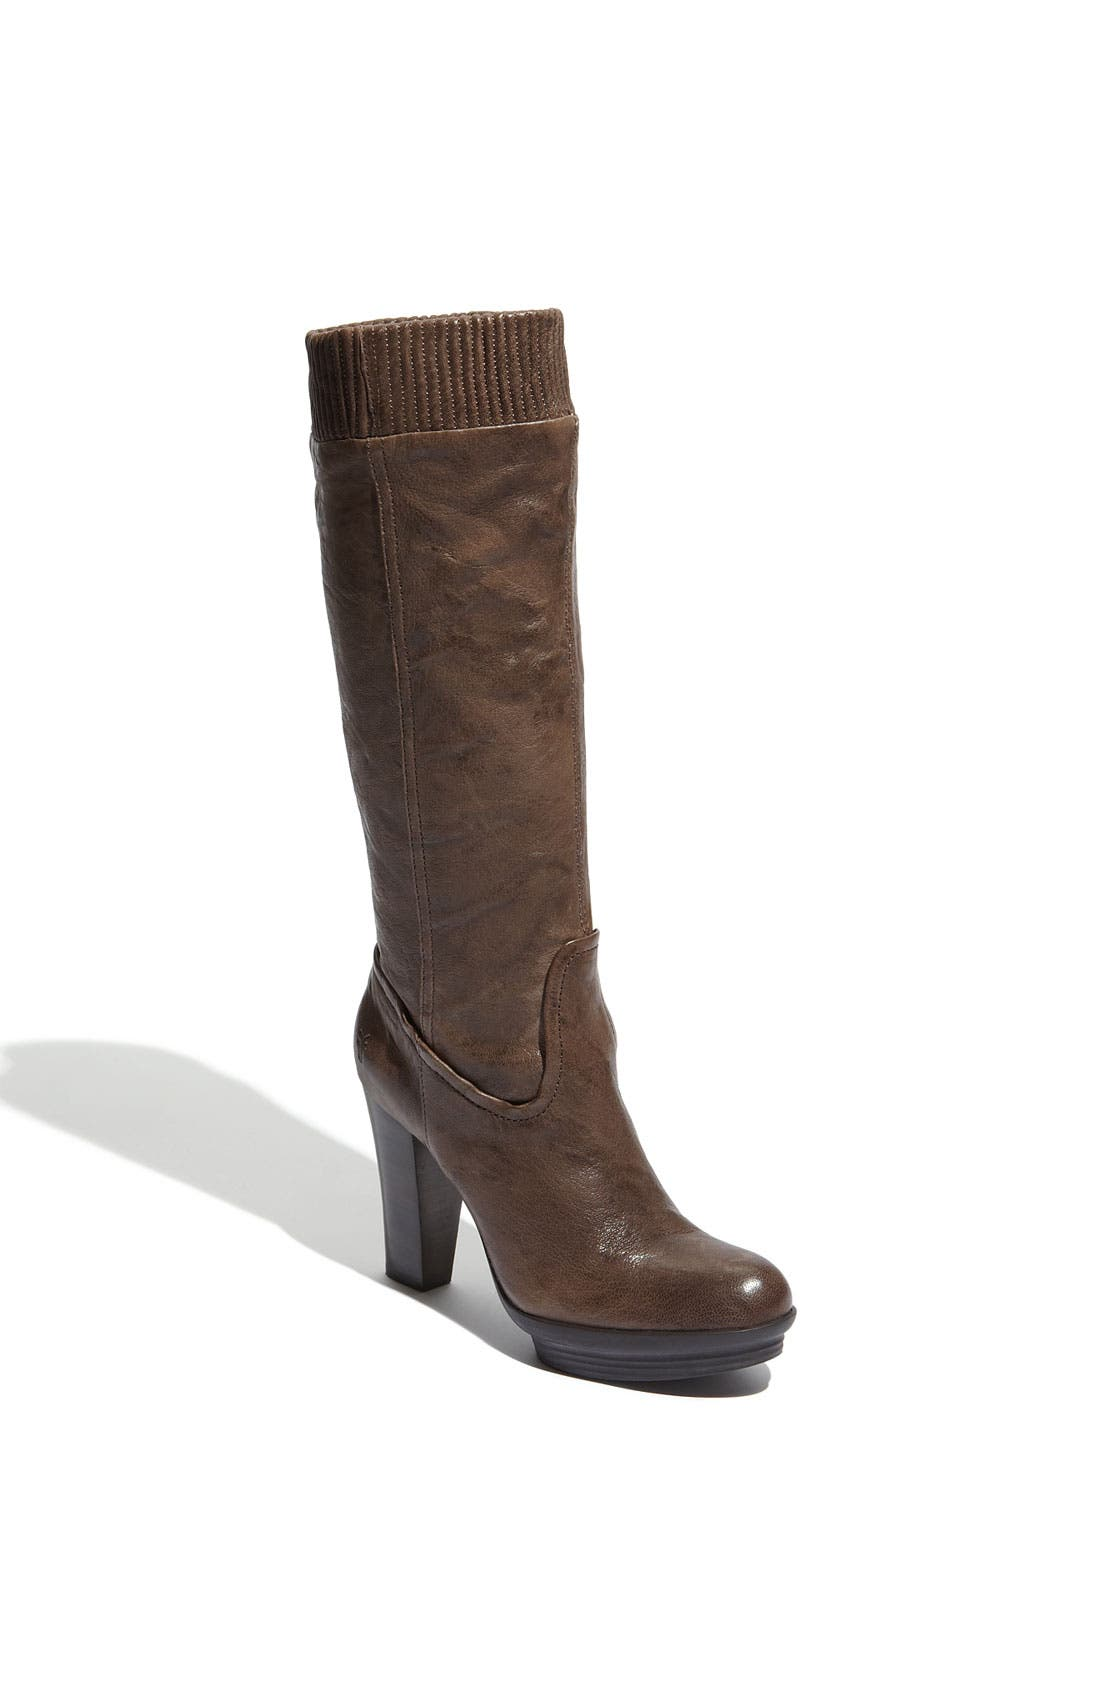 Alternate Image 1 Selected - Frye 'Mimi' Boot